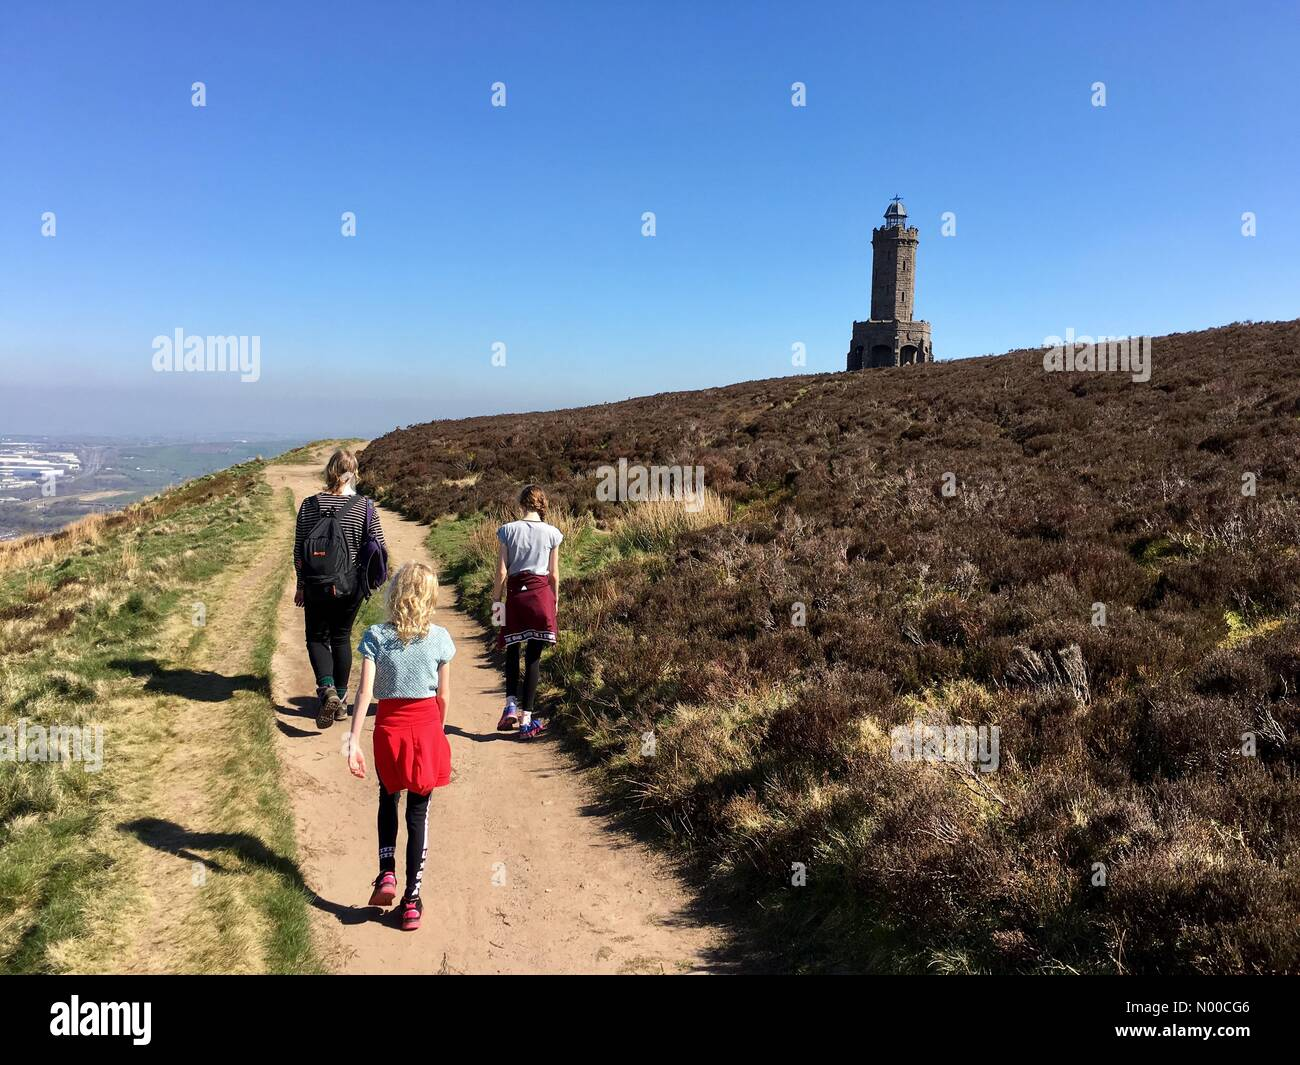 Uk Weather Day In Blackburn Lancashire Family Walking In Sun Towards Darwen Tower On The Moors Above Blackburn